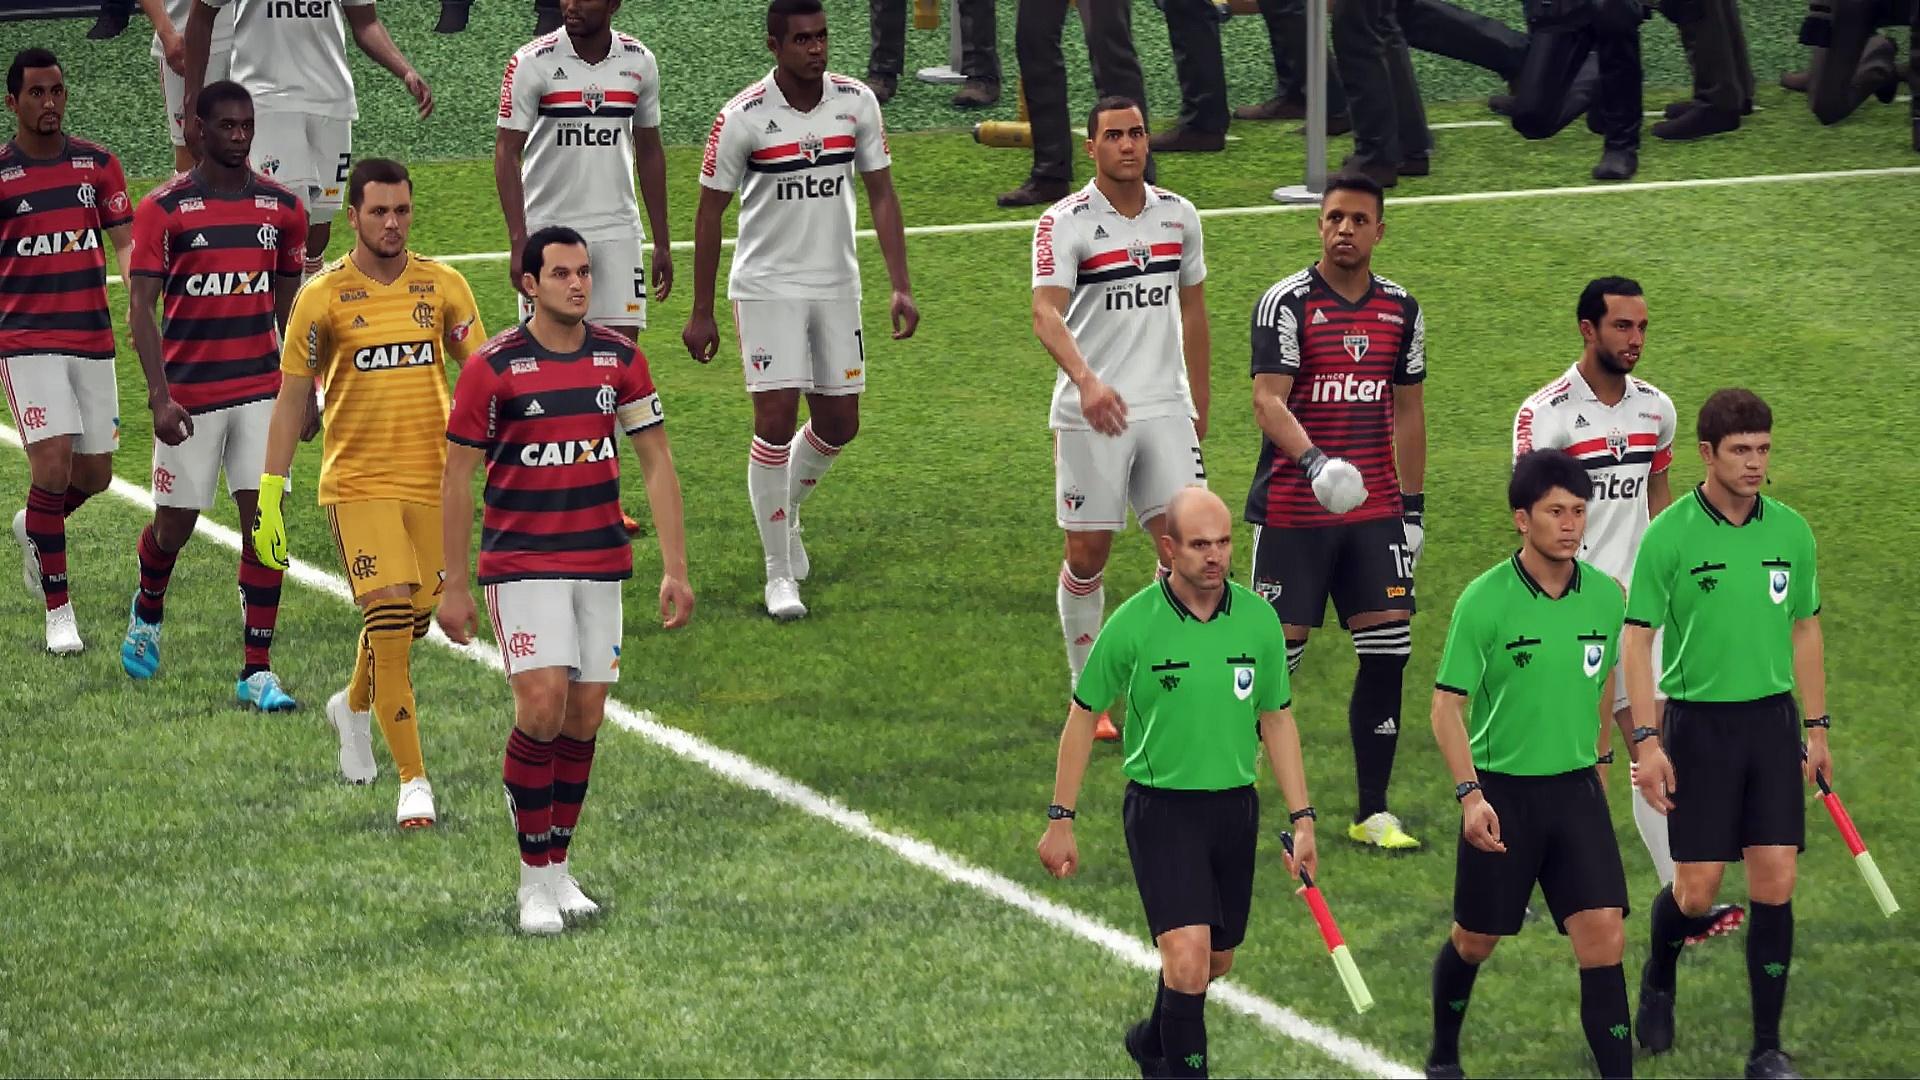 PES 2019 PC SaoPaulo-Flamengo demo